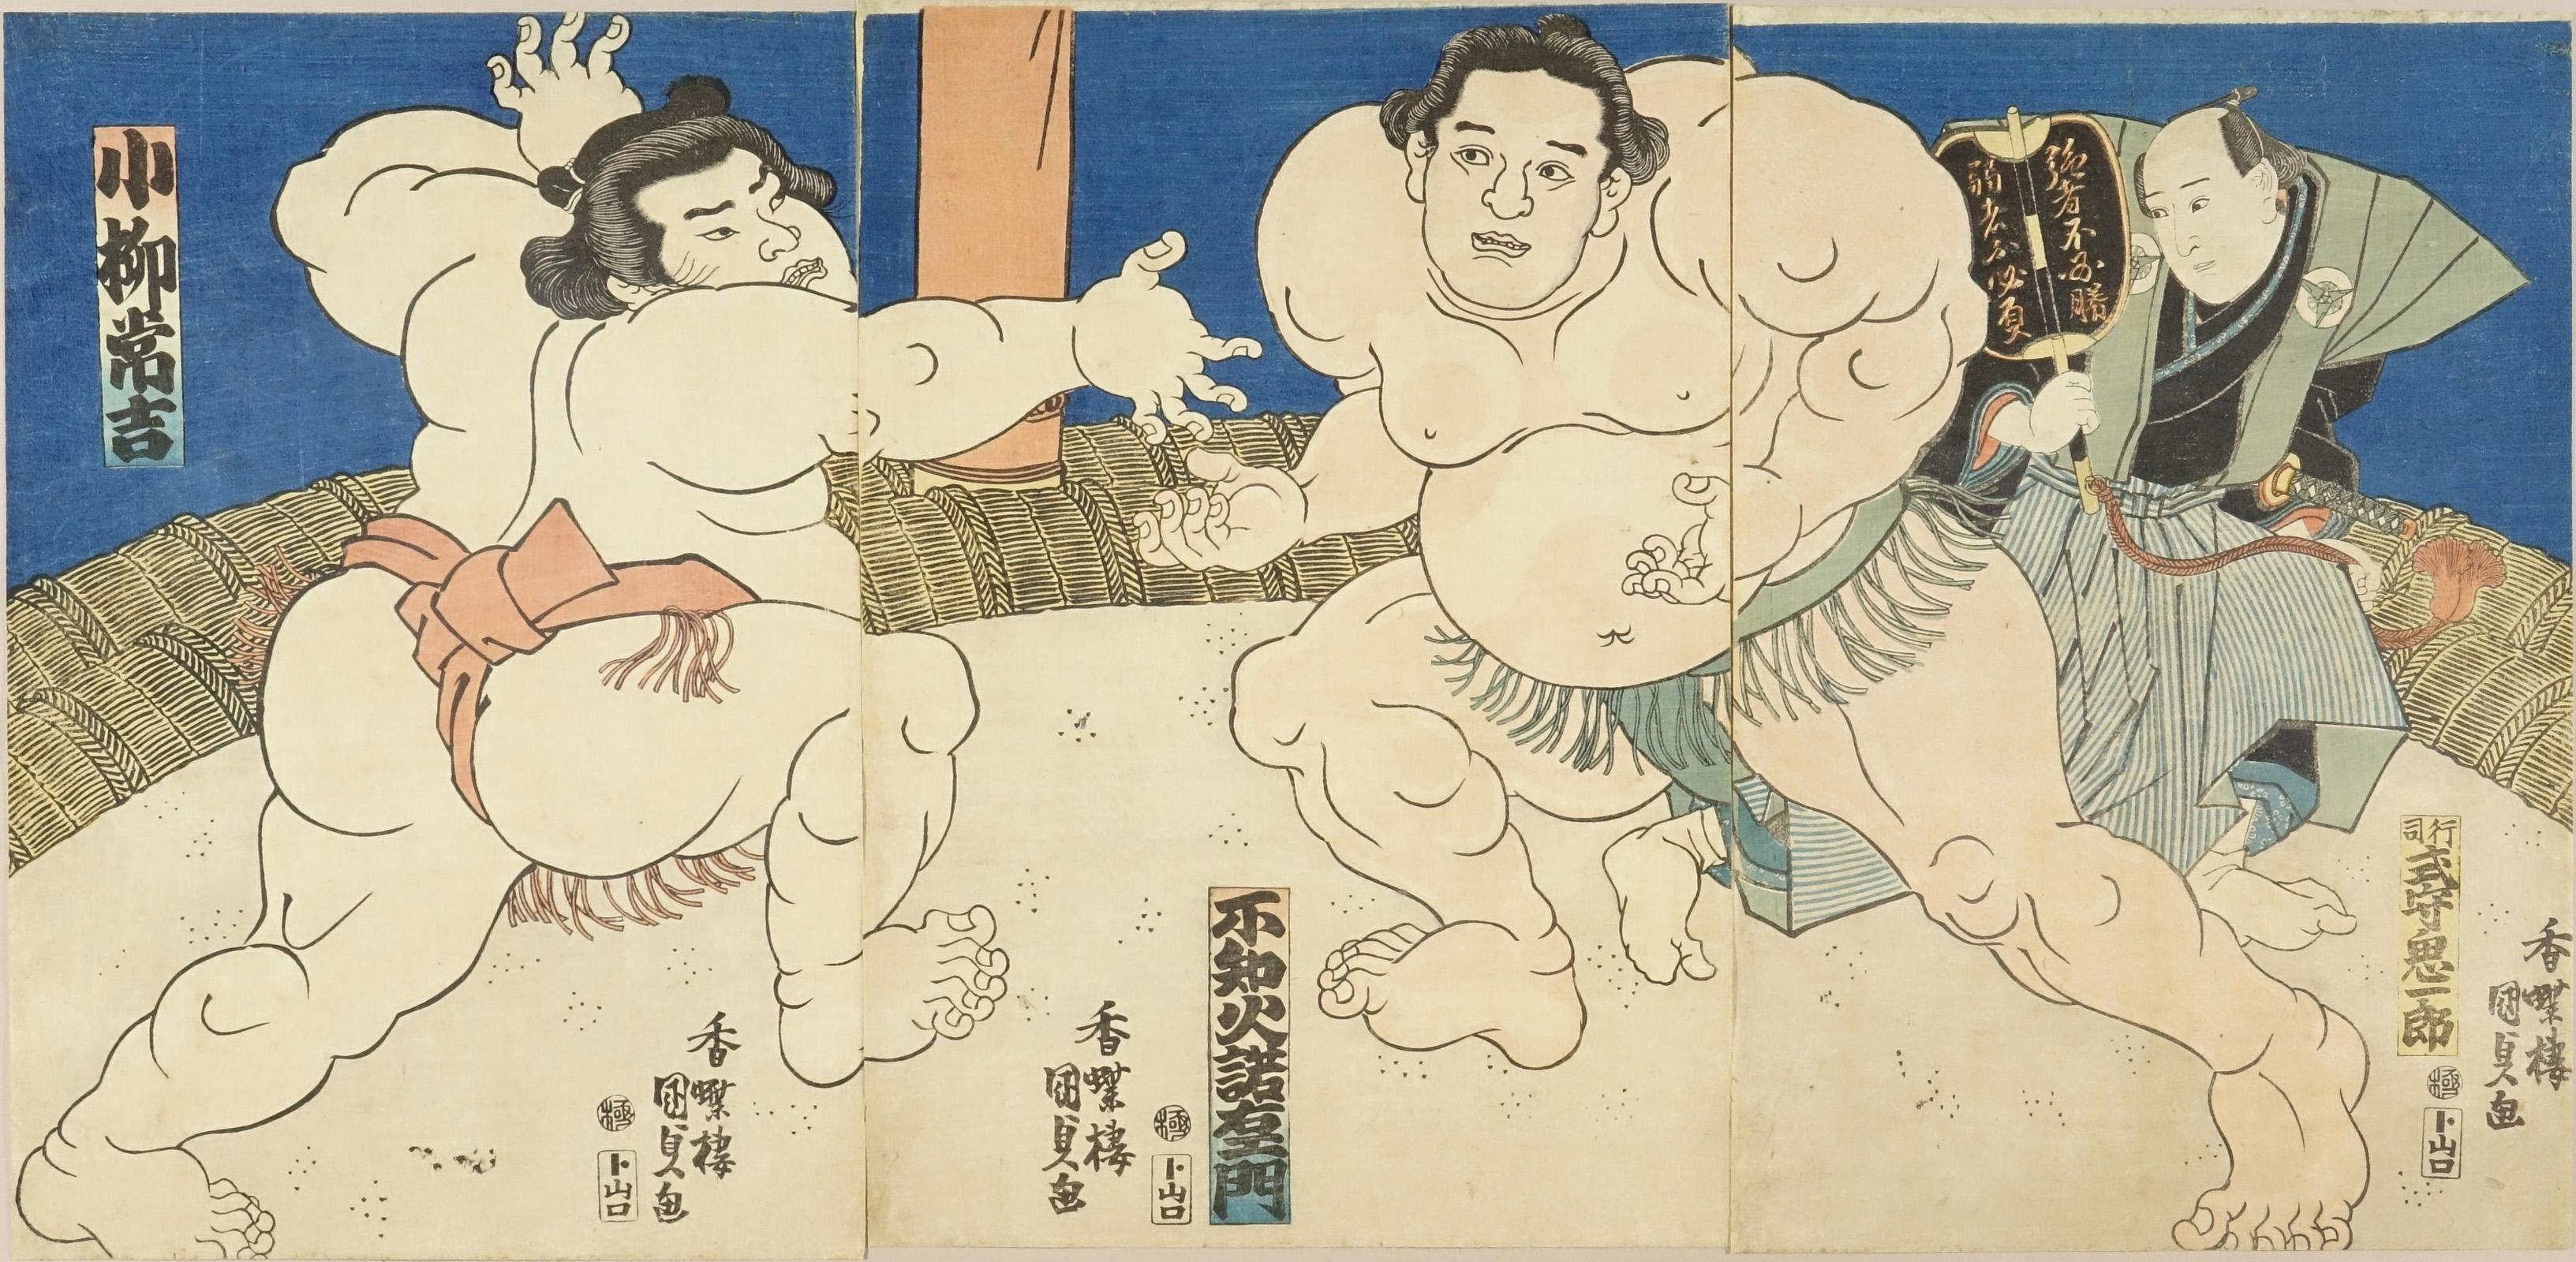 KUNISADA Sumo bout between Shiranui Dakuemon (Kumamoto Pref.) and Koyanagi Jokichi (Chiba Pref.), triptych